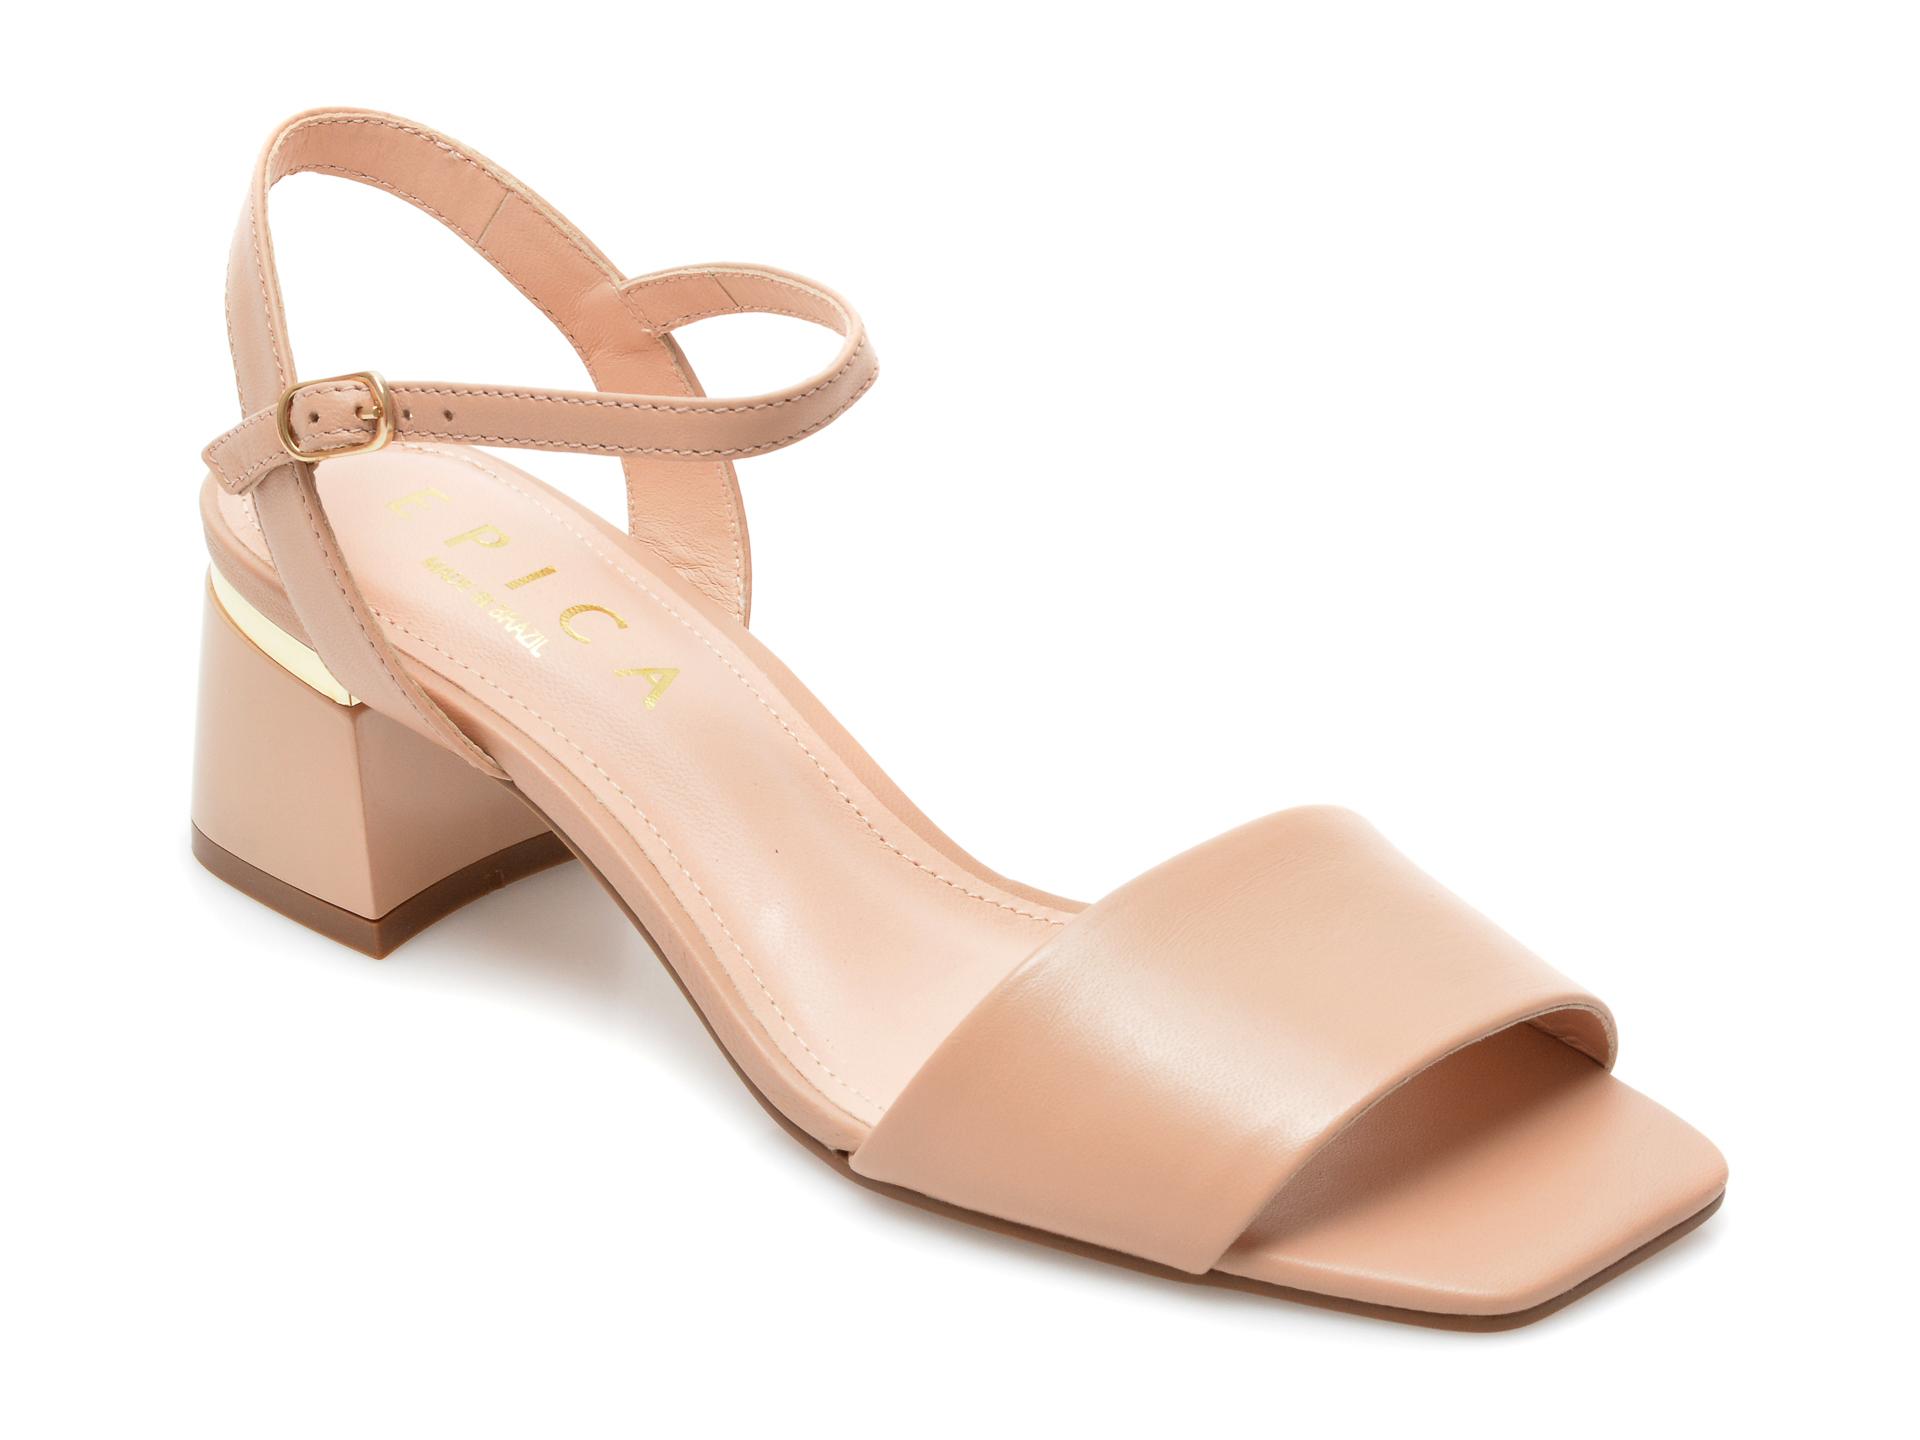 Sandale EPICA nude, 1752724, din piele naturala imagine otter.ro 2021